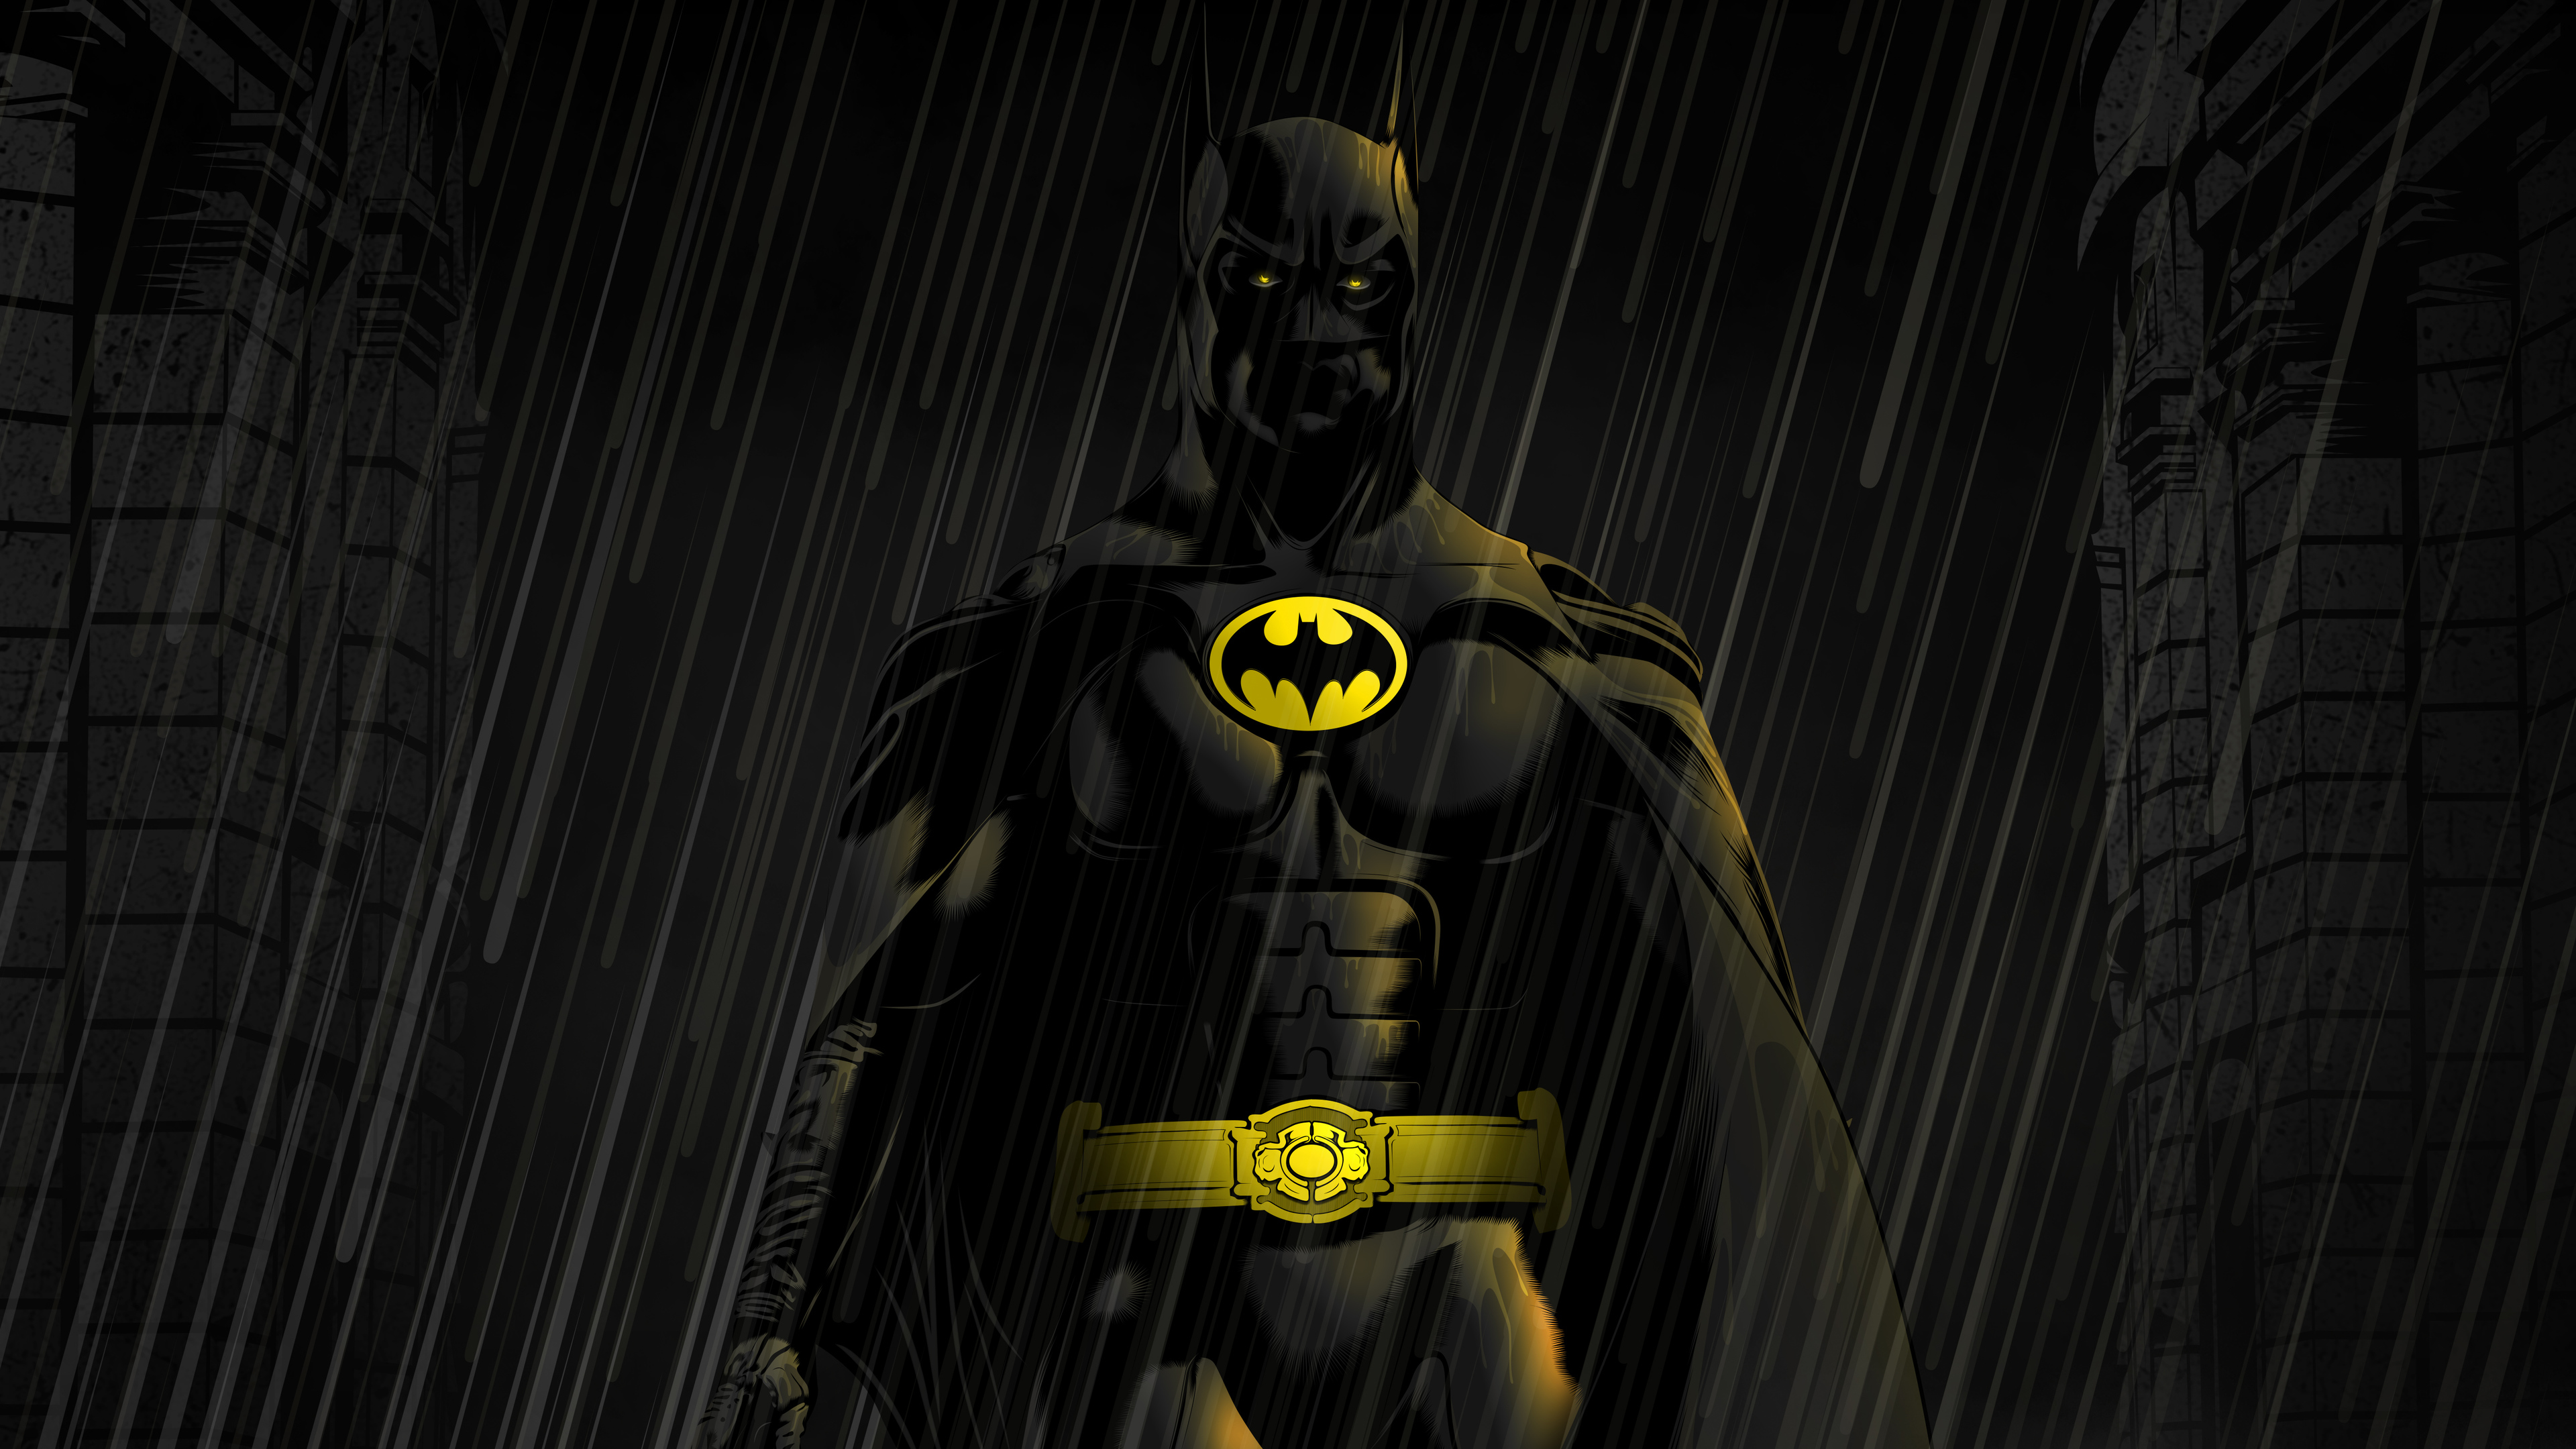 batman michael keaton 1543620050 - Batman Michael Keaton - superheroes wallpapers, hd-wallpapers, digital art wallpapers, batman wallpapers, artwork wallpapers, 4k-wallpapers